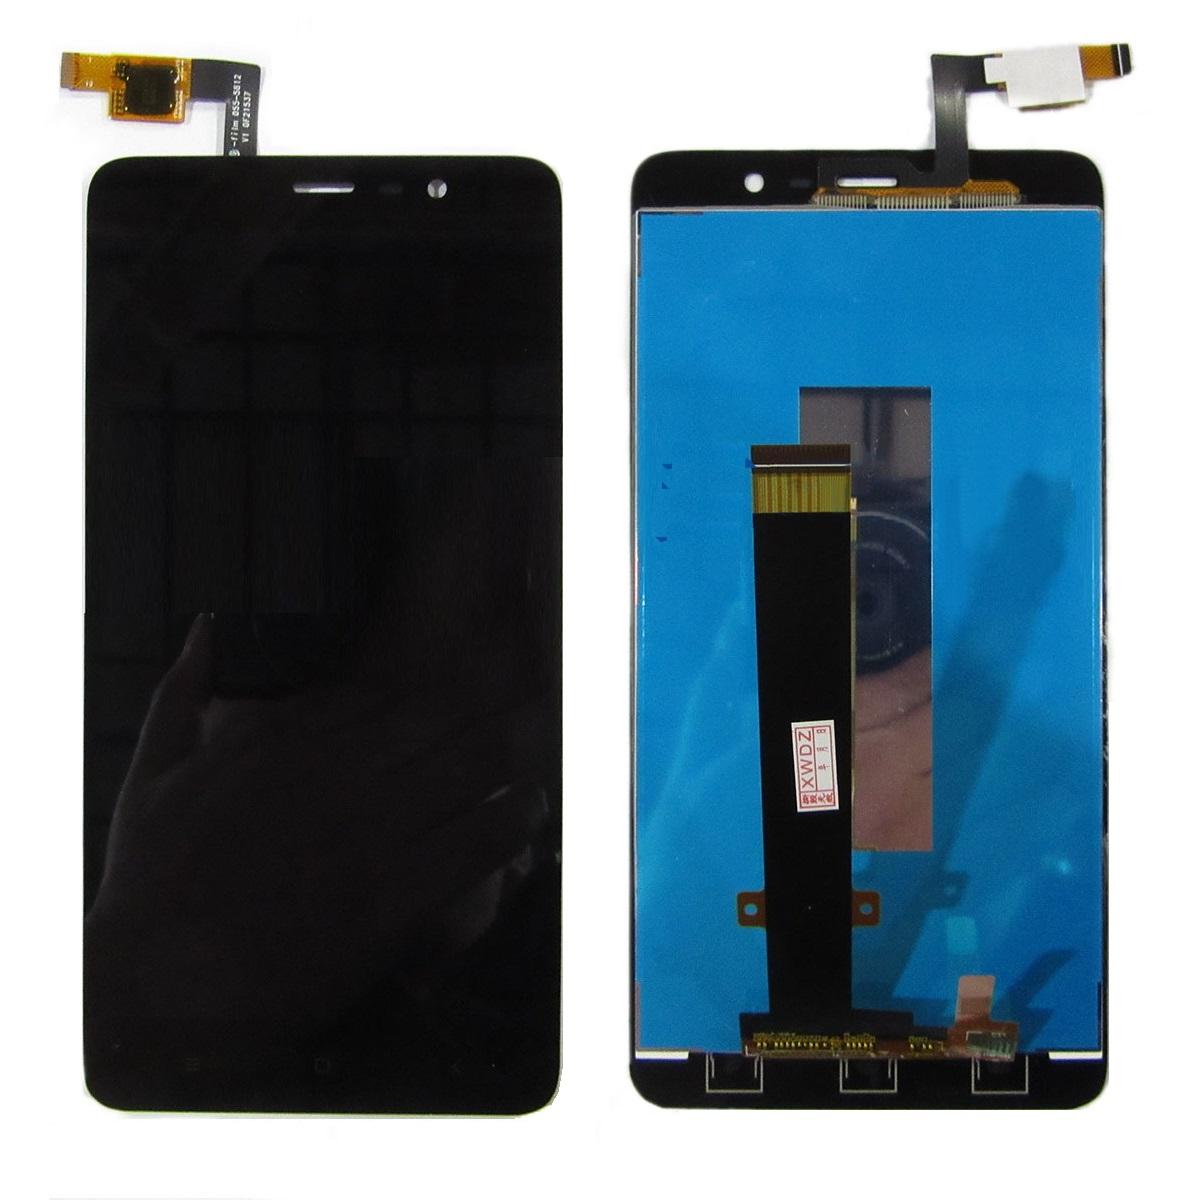 Redmi Note 3 LCD Screen